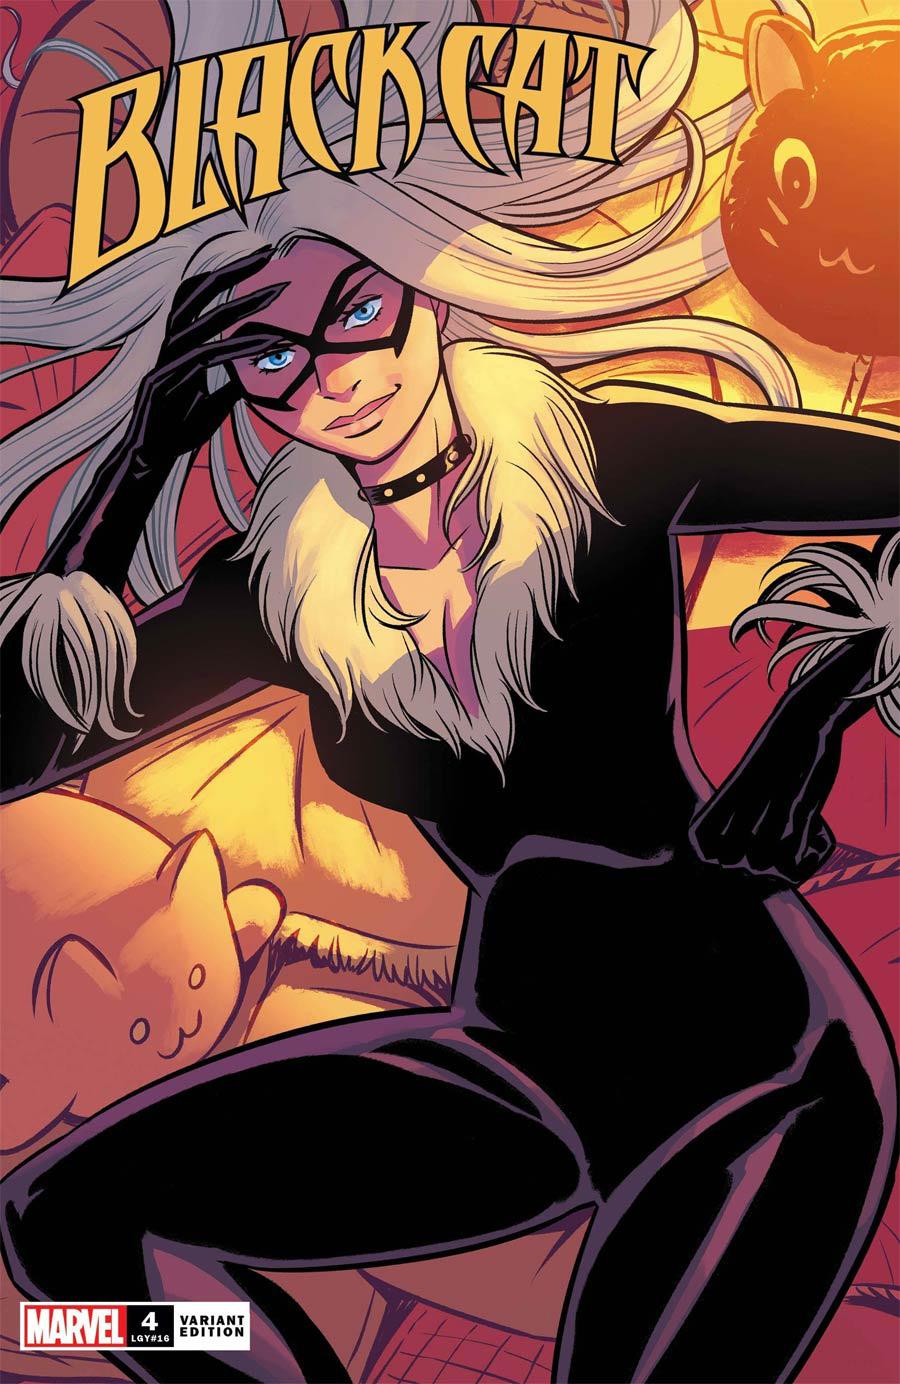 Black Cat Vol 2 #4 Cover C Variant Natacha Bustos Cover